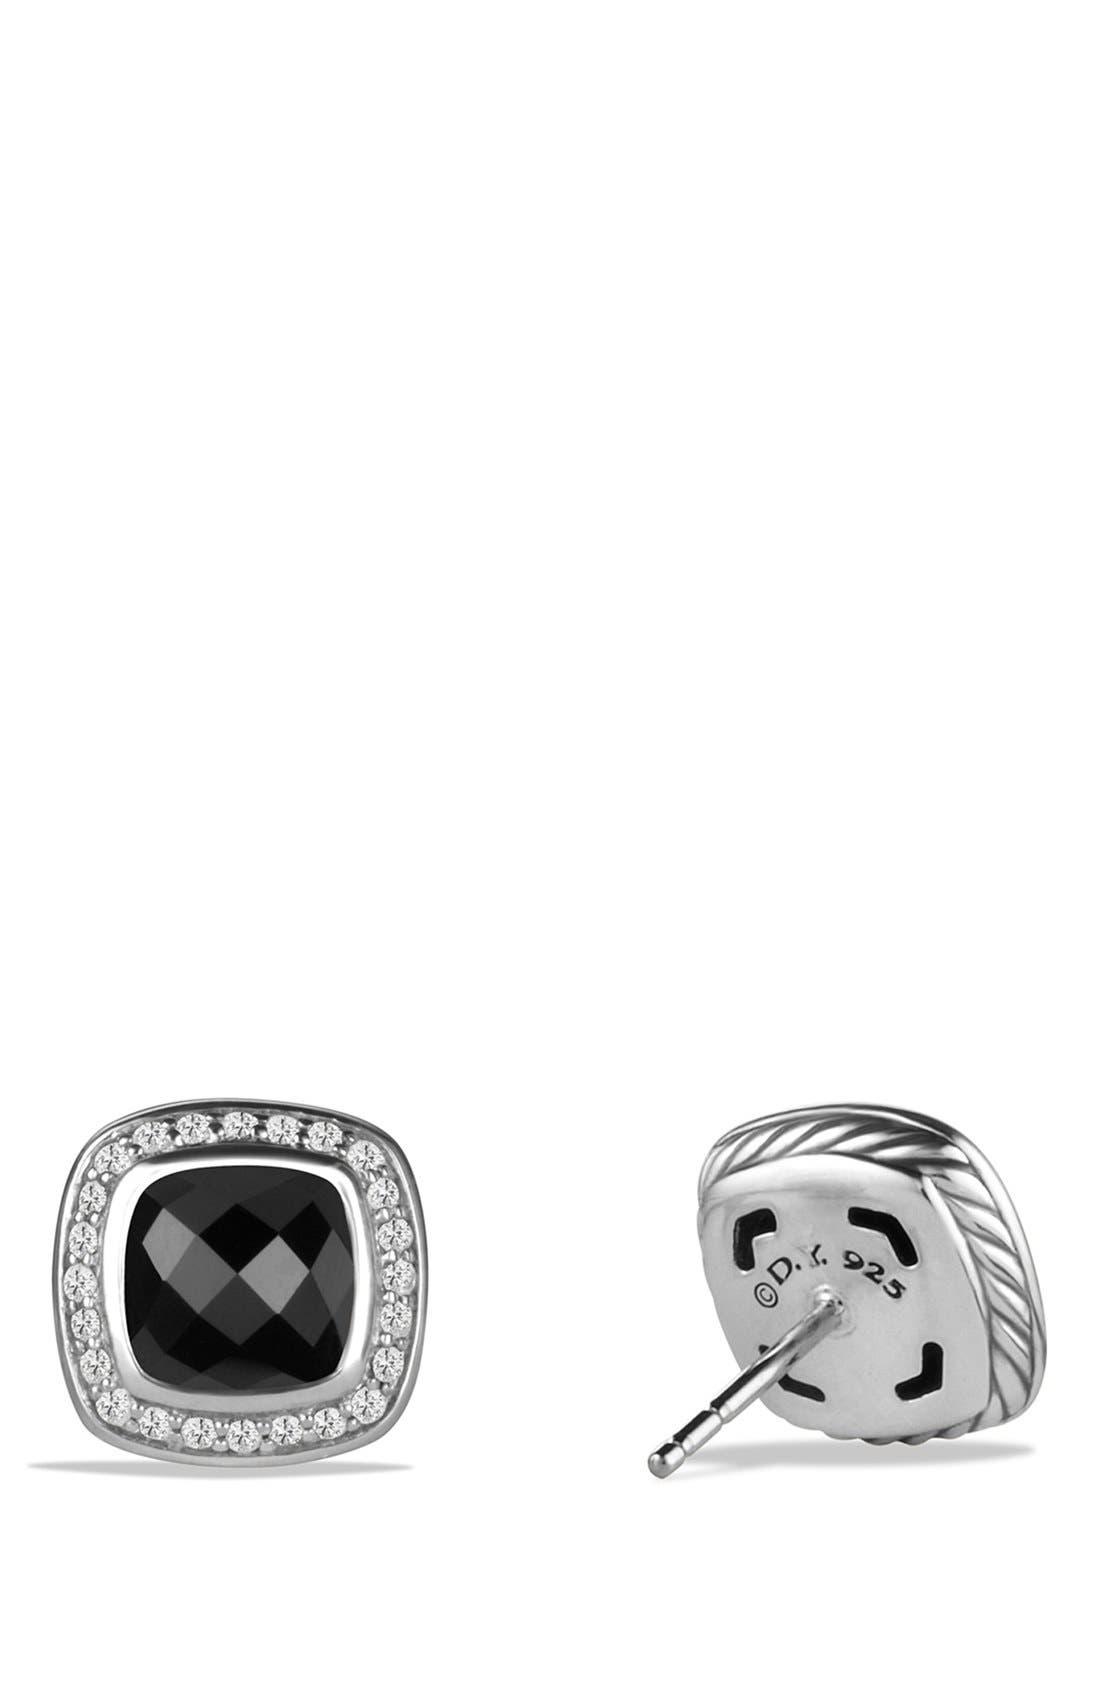 Alternate Image 2  - David Yurman 'Albion' Earrings with Semiprecious Stone and Diamonds